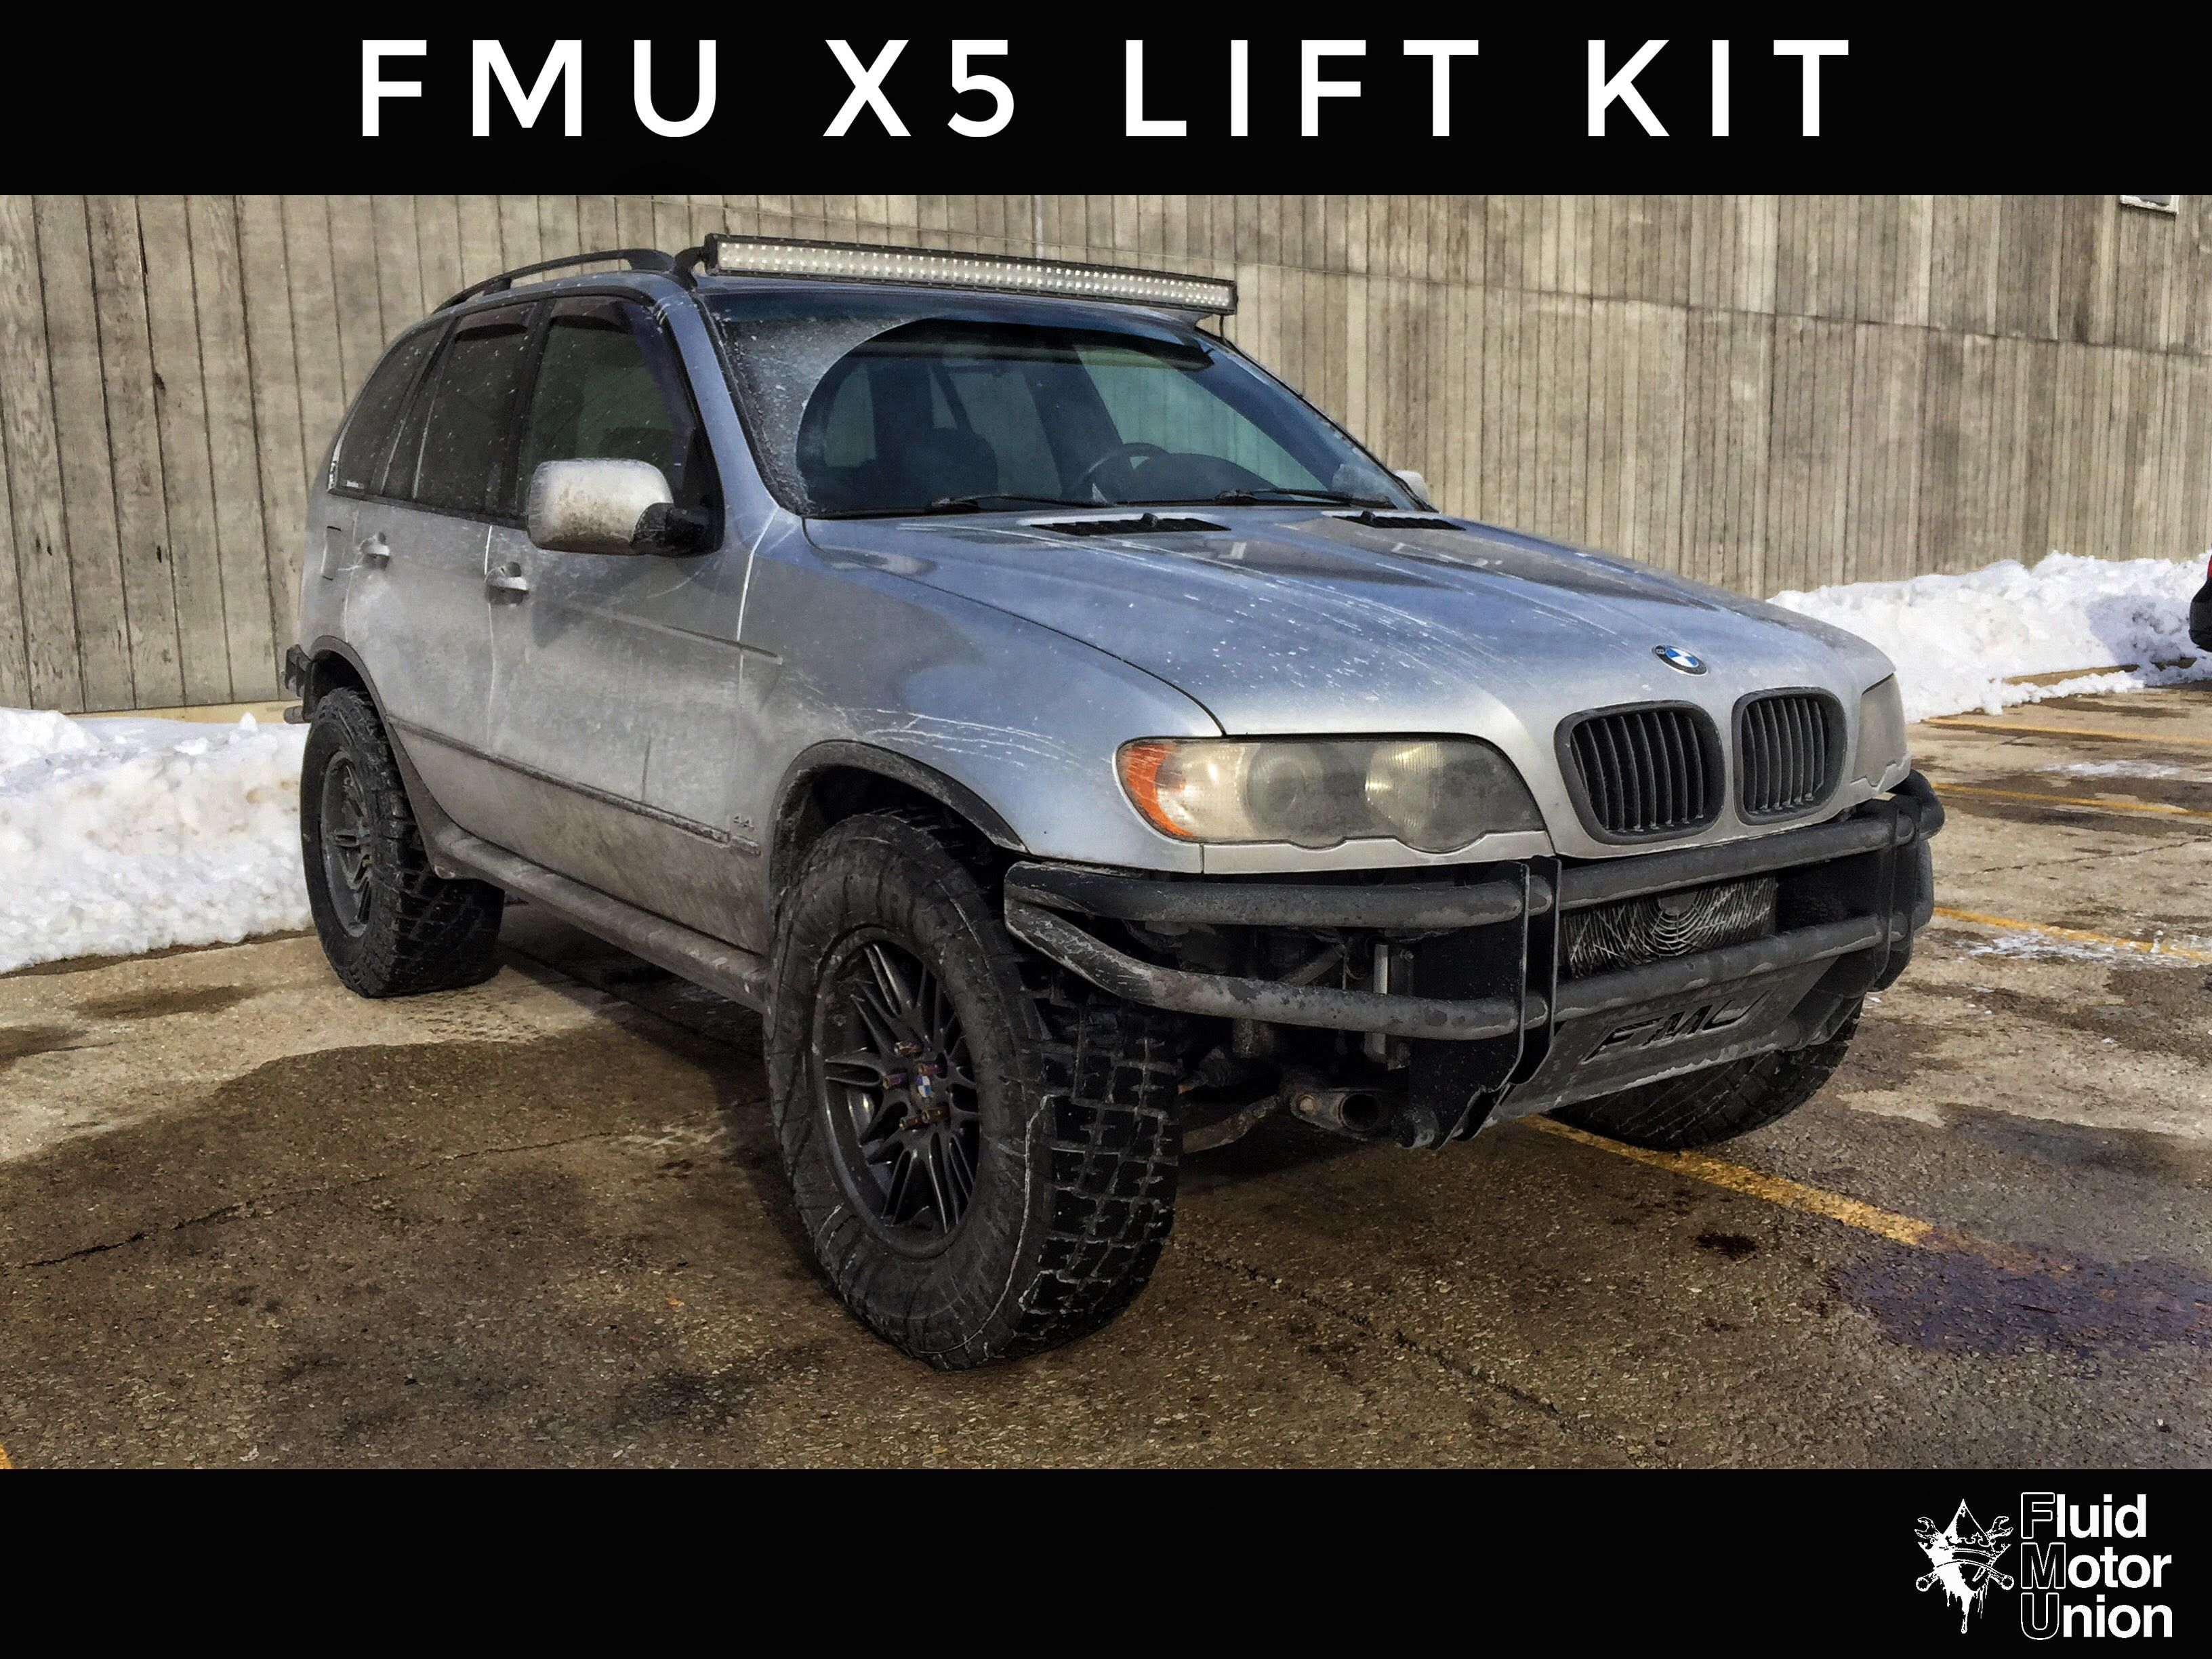 Off road x5 archives luxury european service performance fluid motorunion bmw